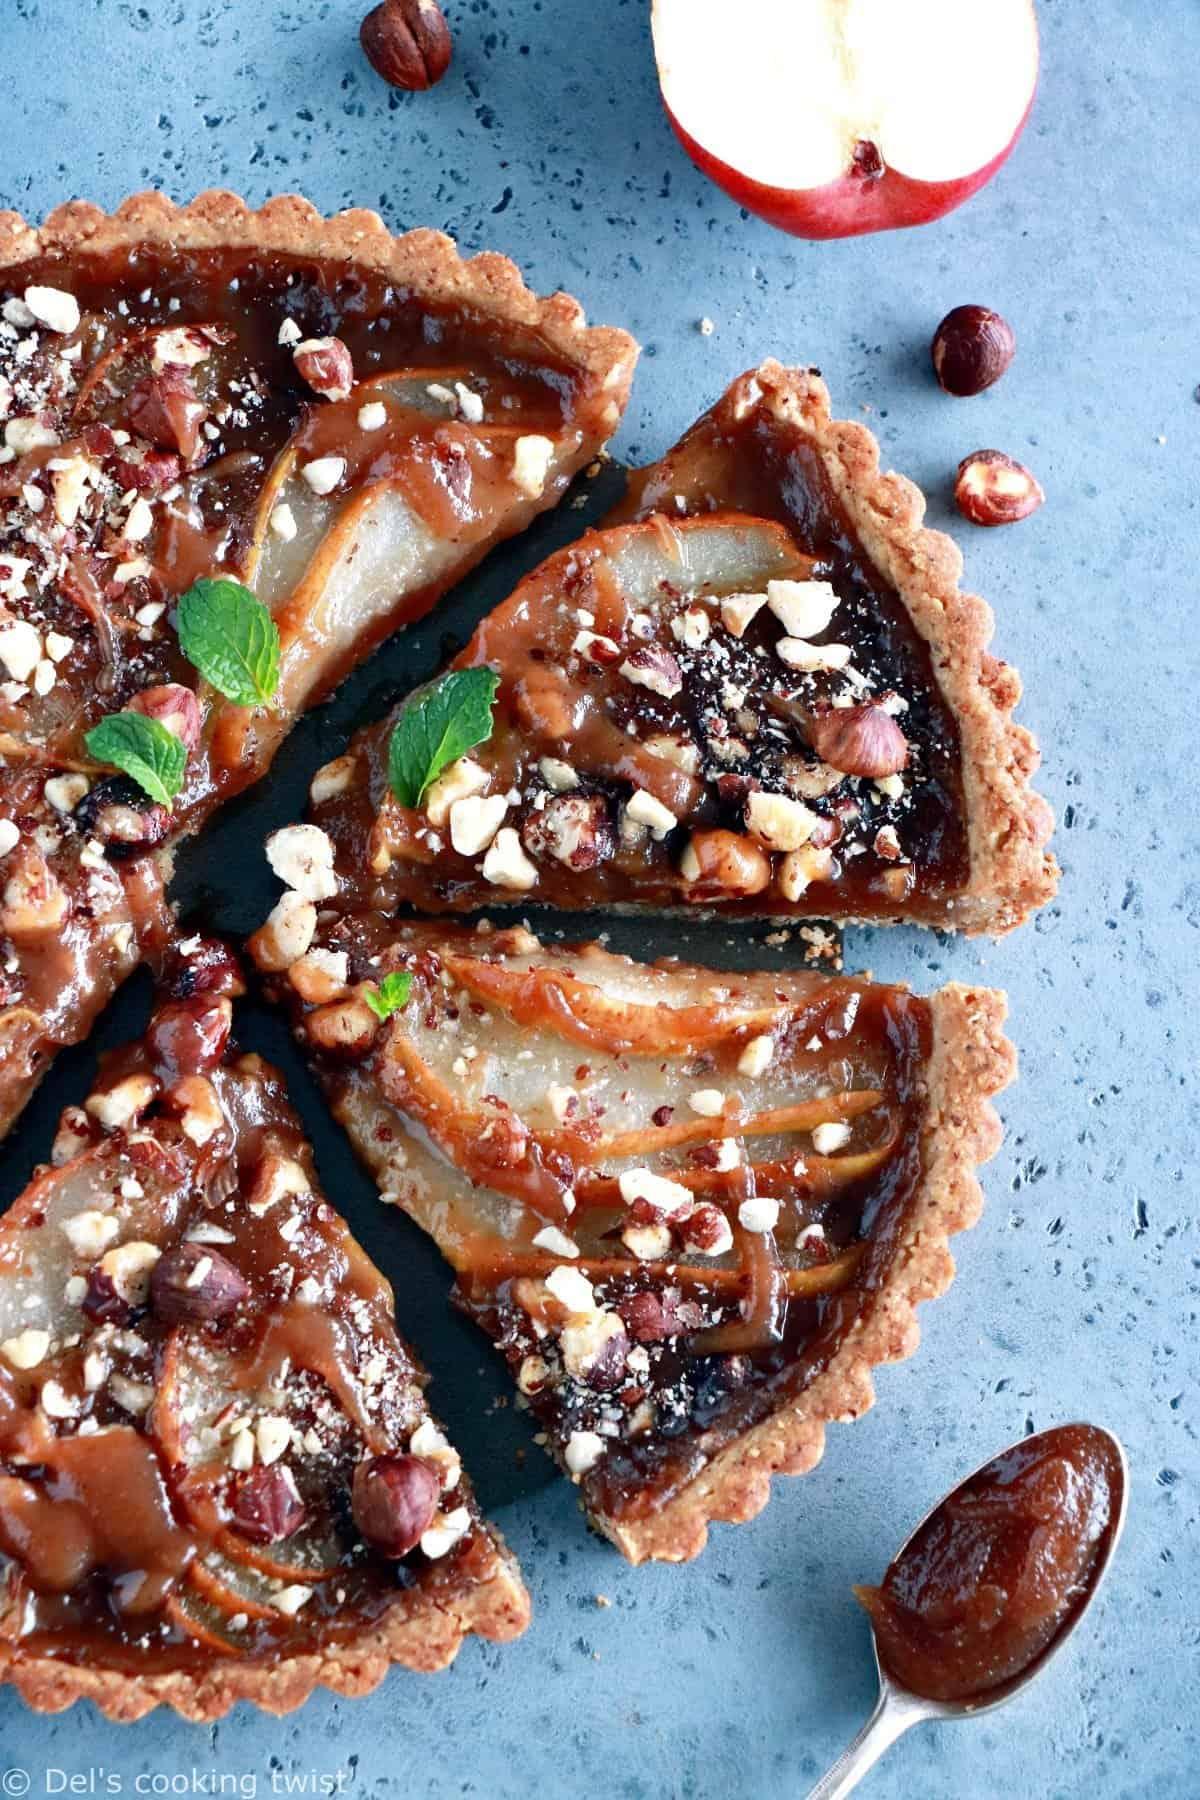 Pear and Chestnut Tart with Hazelnut Crust